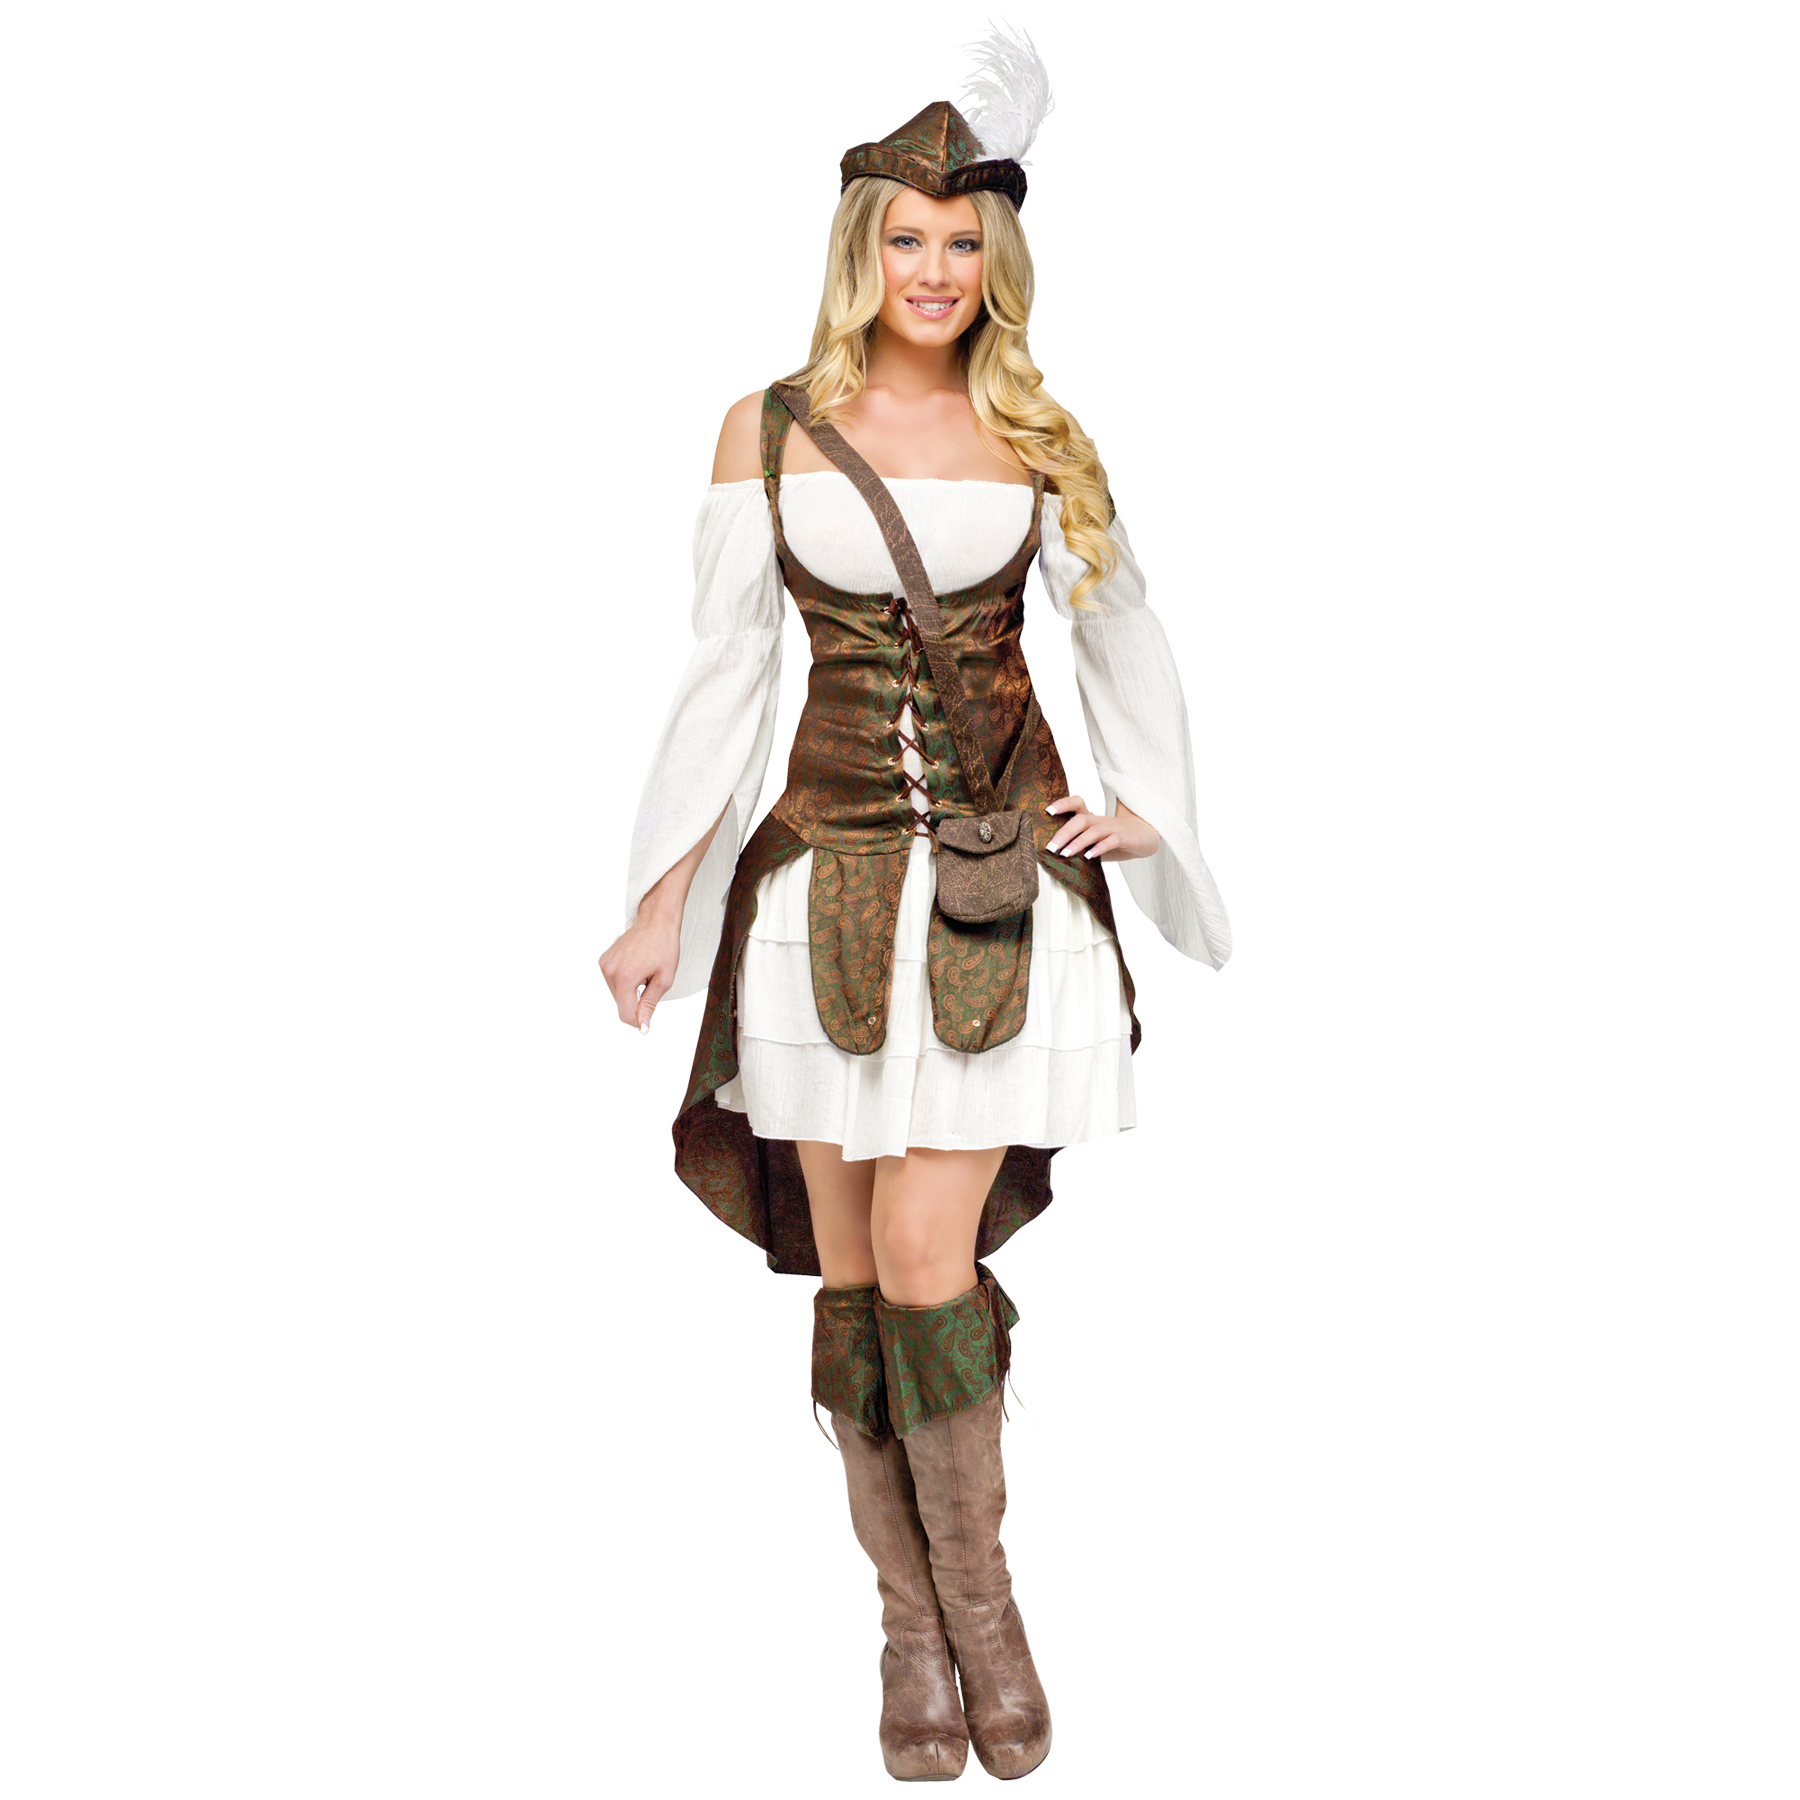 Women's Robin Hood Costume PartNumber: 3ZZVA92421912P MfgPartNumber: FW122864